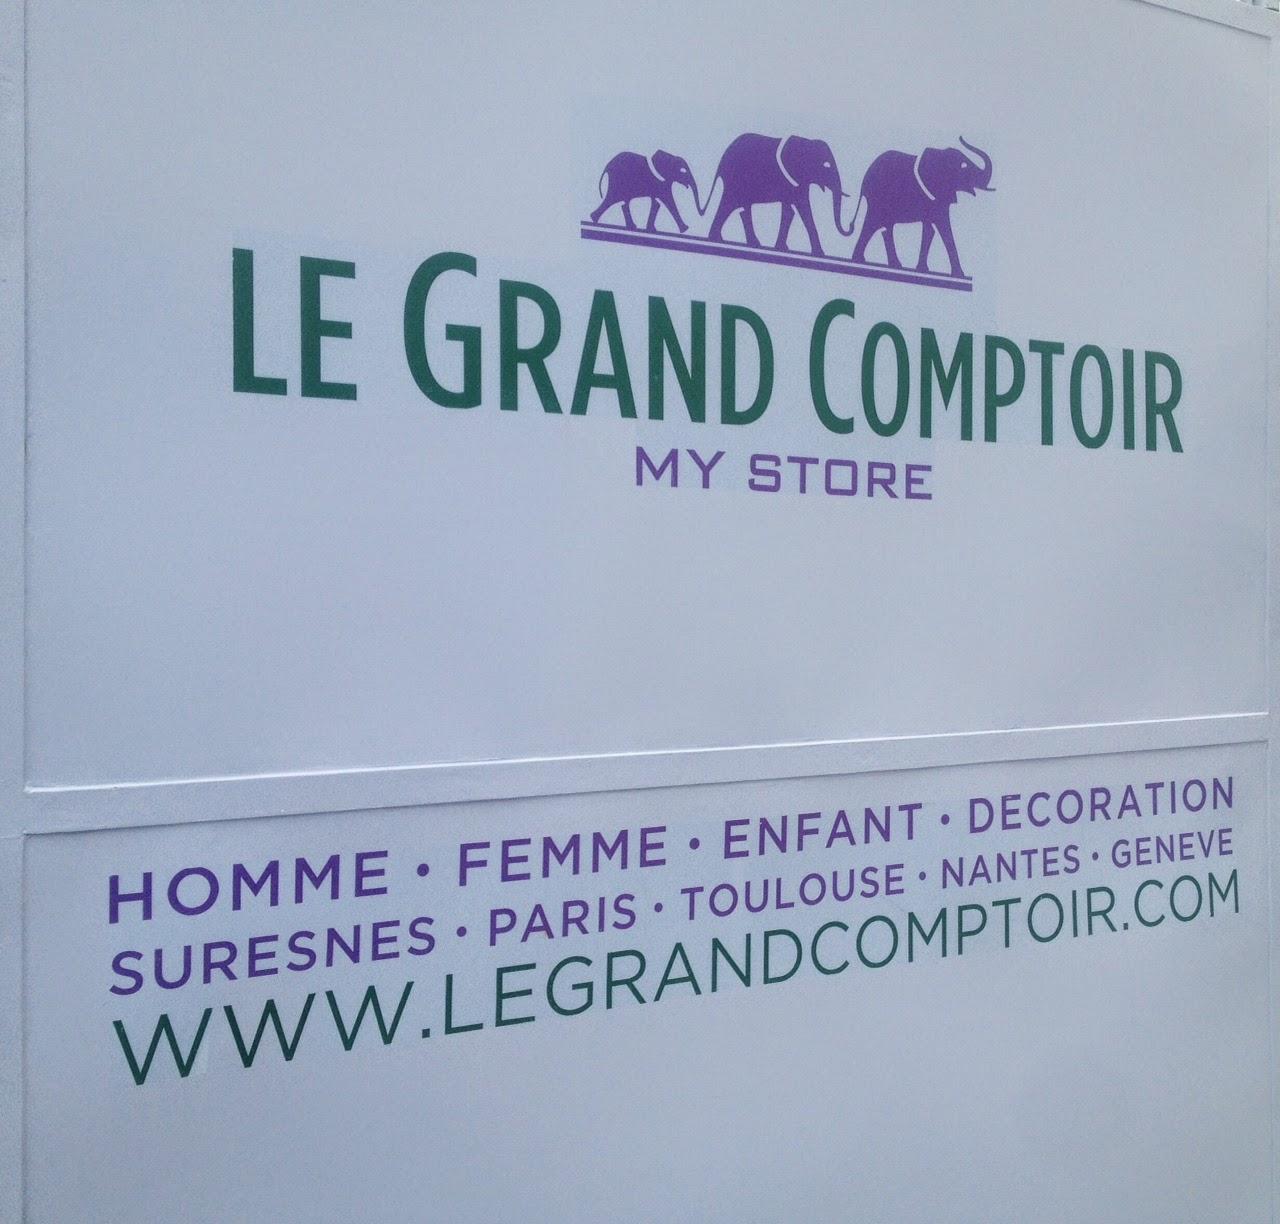 Le Grand Comptoir sign